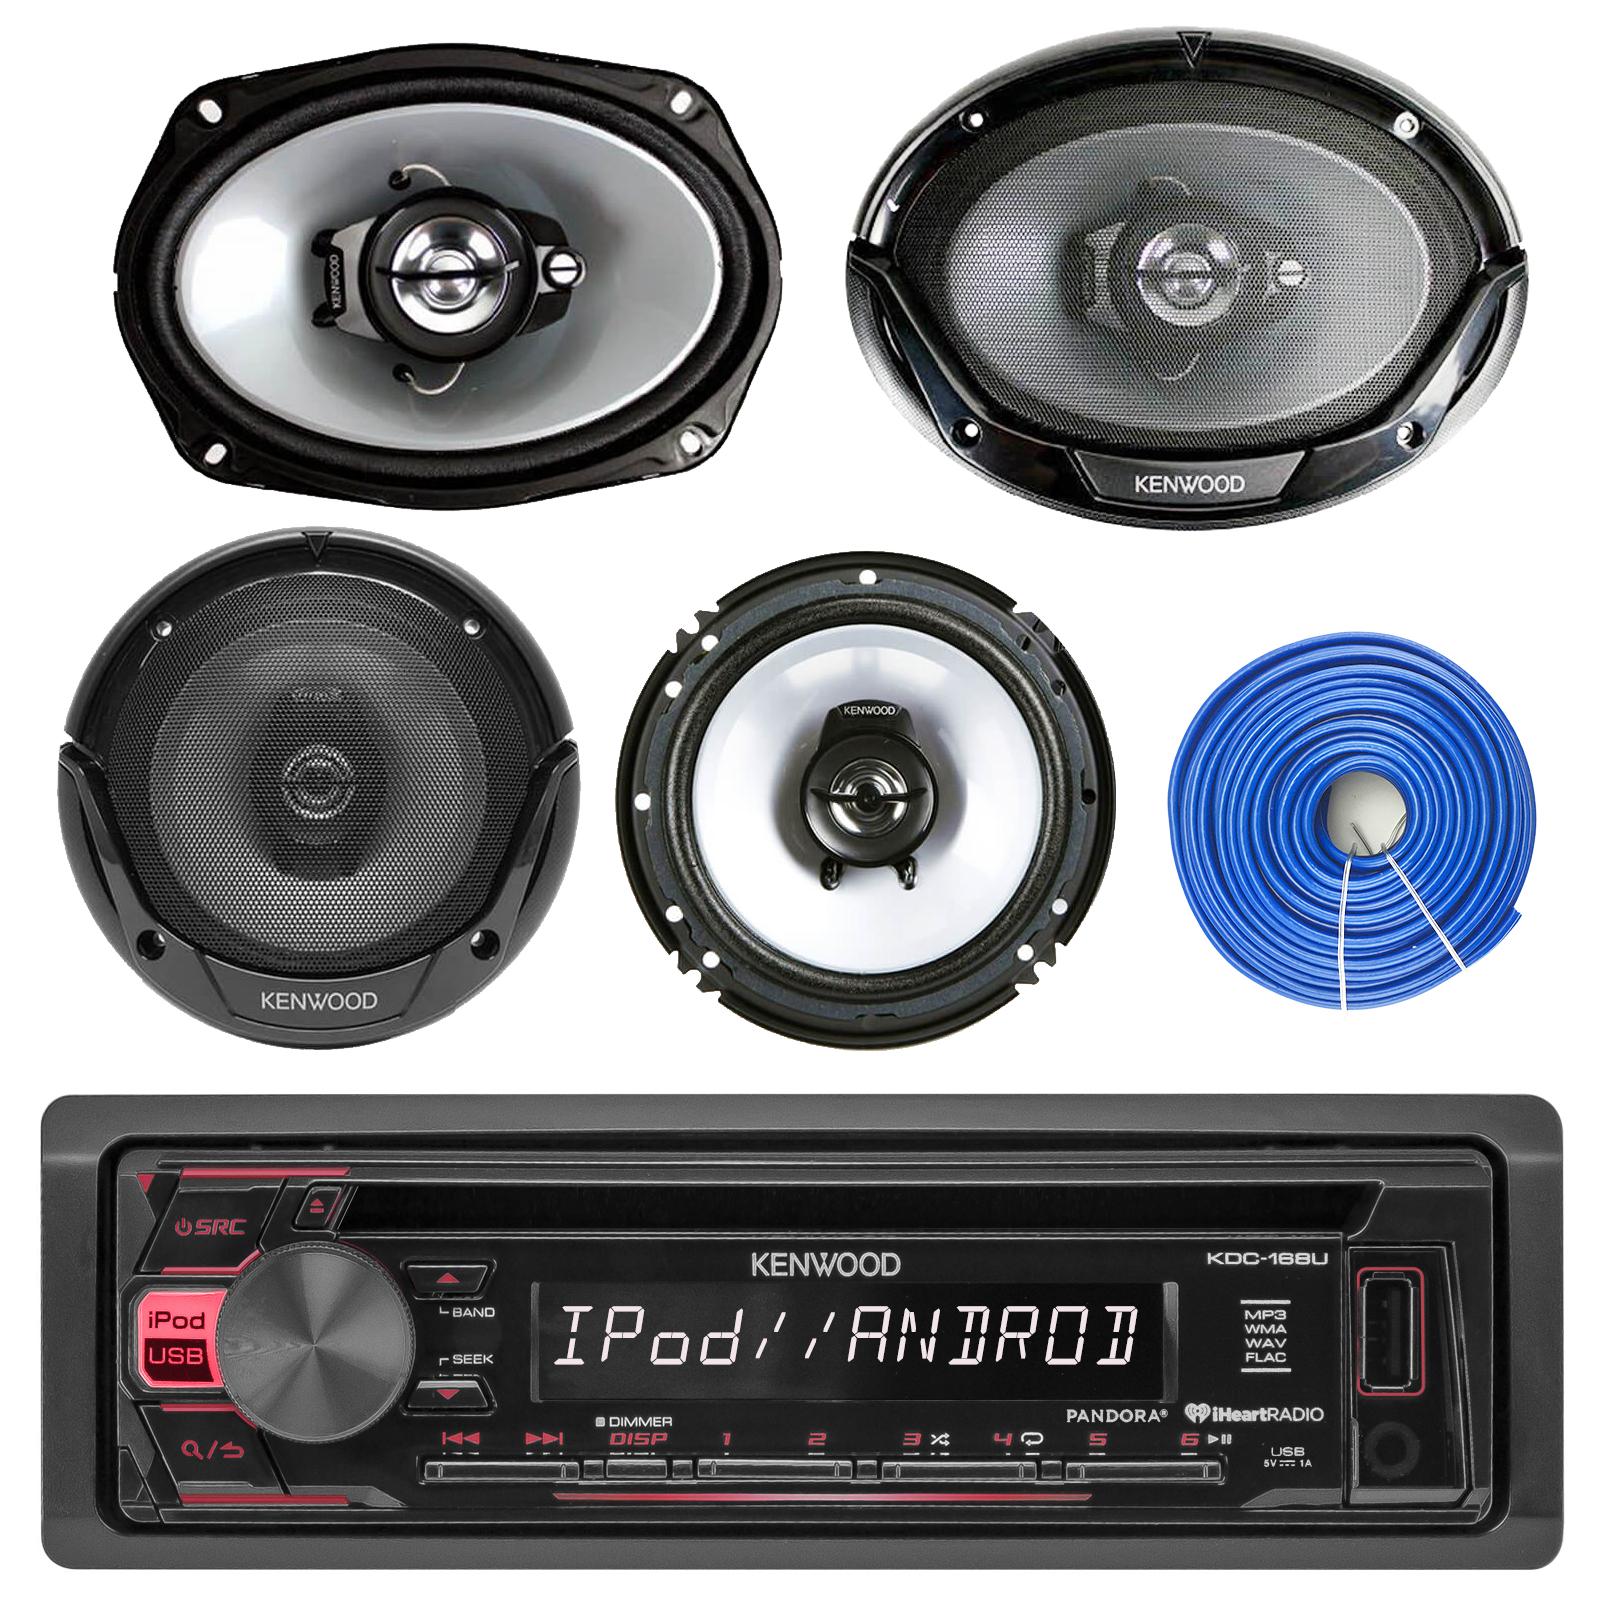 Kenwood Usb Aux Cd Mp3 Car Receiver 4 6x9 65car Speakers W Kacm3004 Channel 600w Amp Marine Atv Boat Amplifier With Wiring Kit Speaker Wire